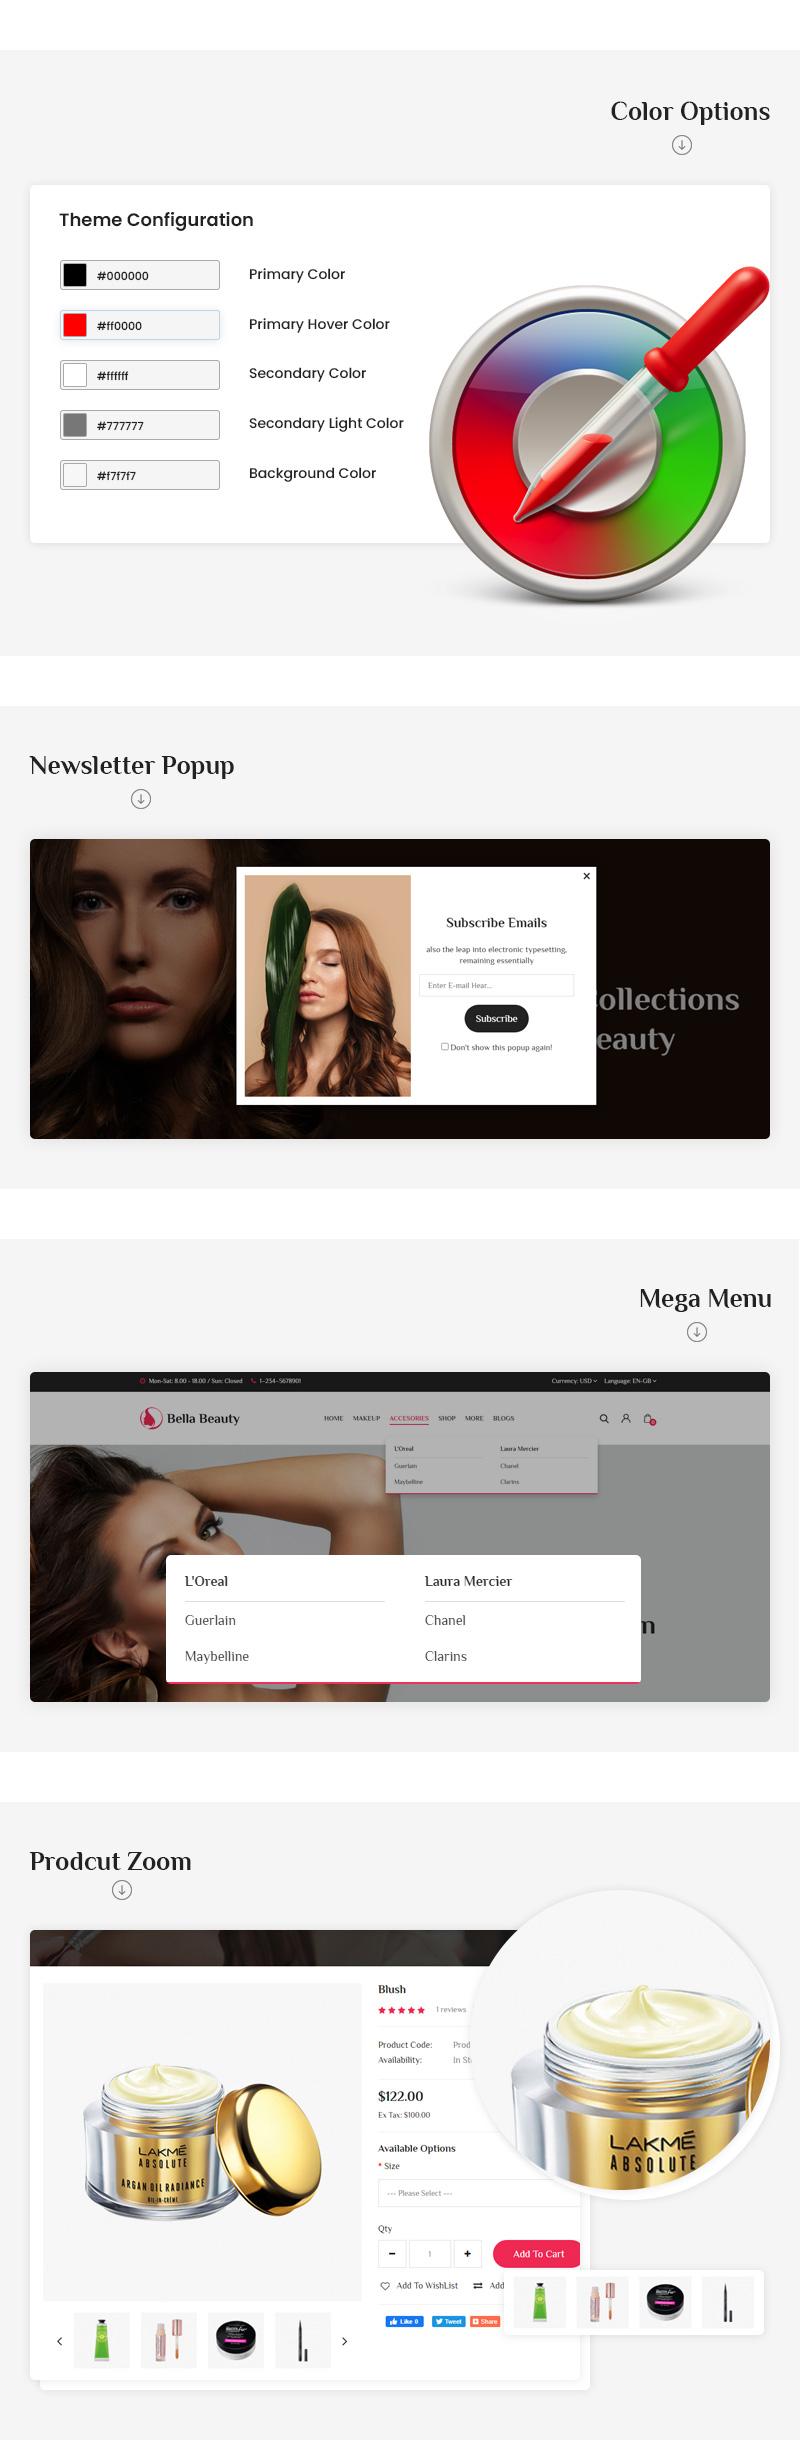 bella-beauty-features-3.jpg